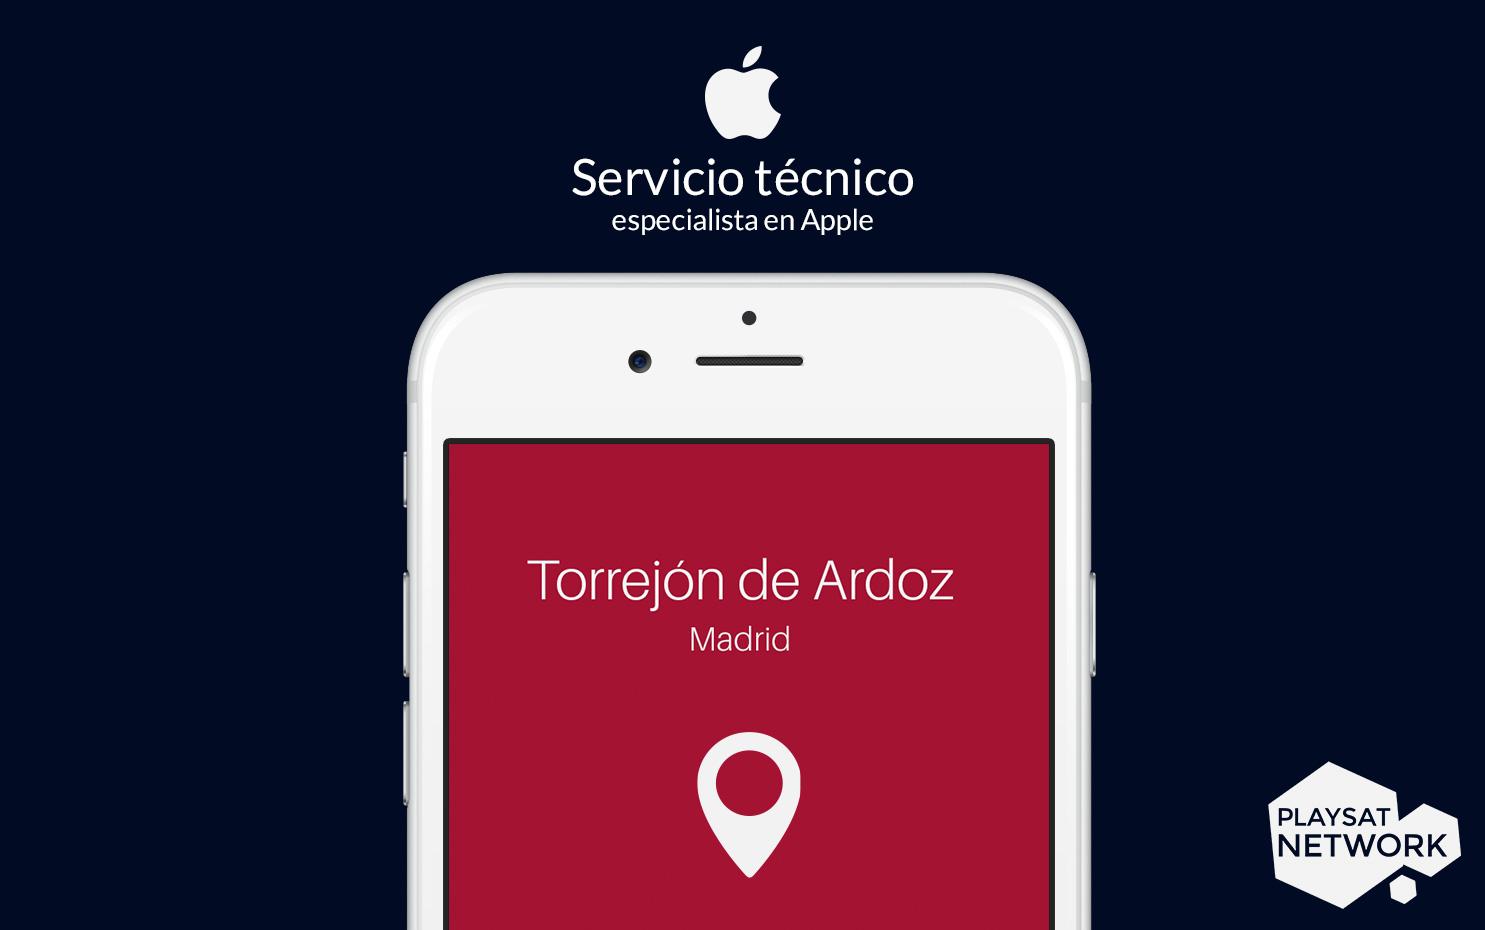 Servicio técnico Apple Torrejón de Ardoz